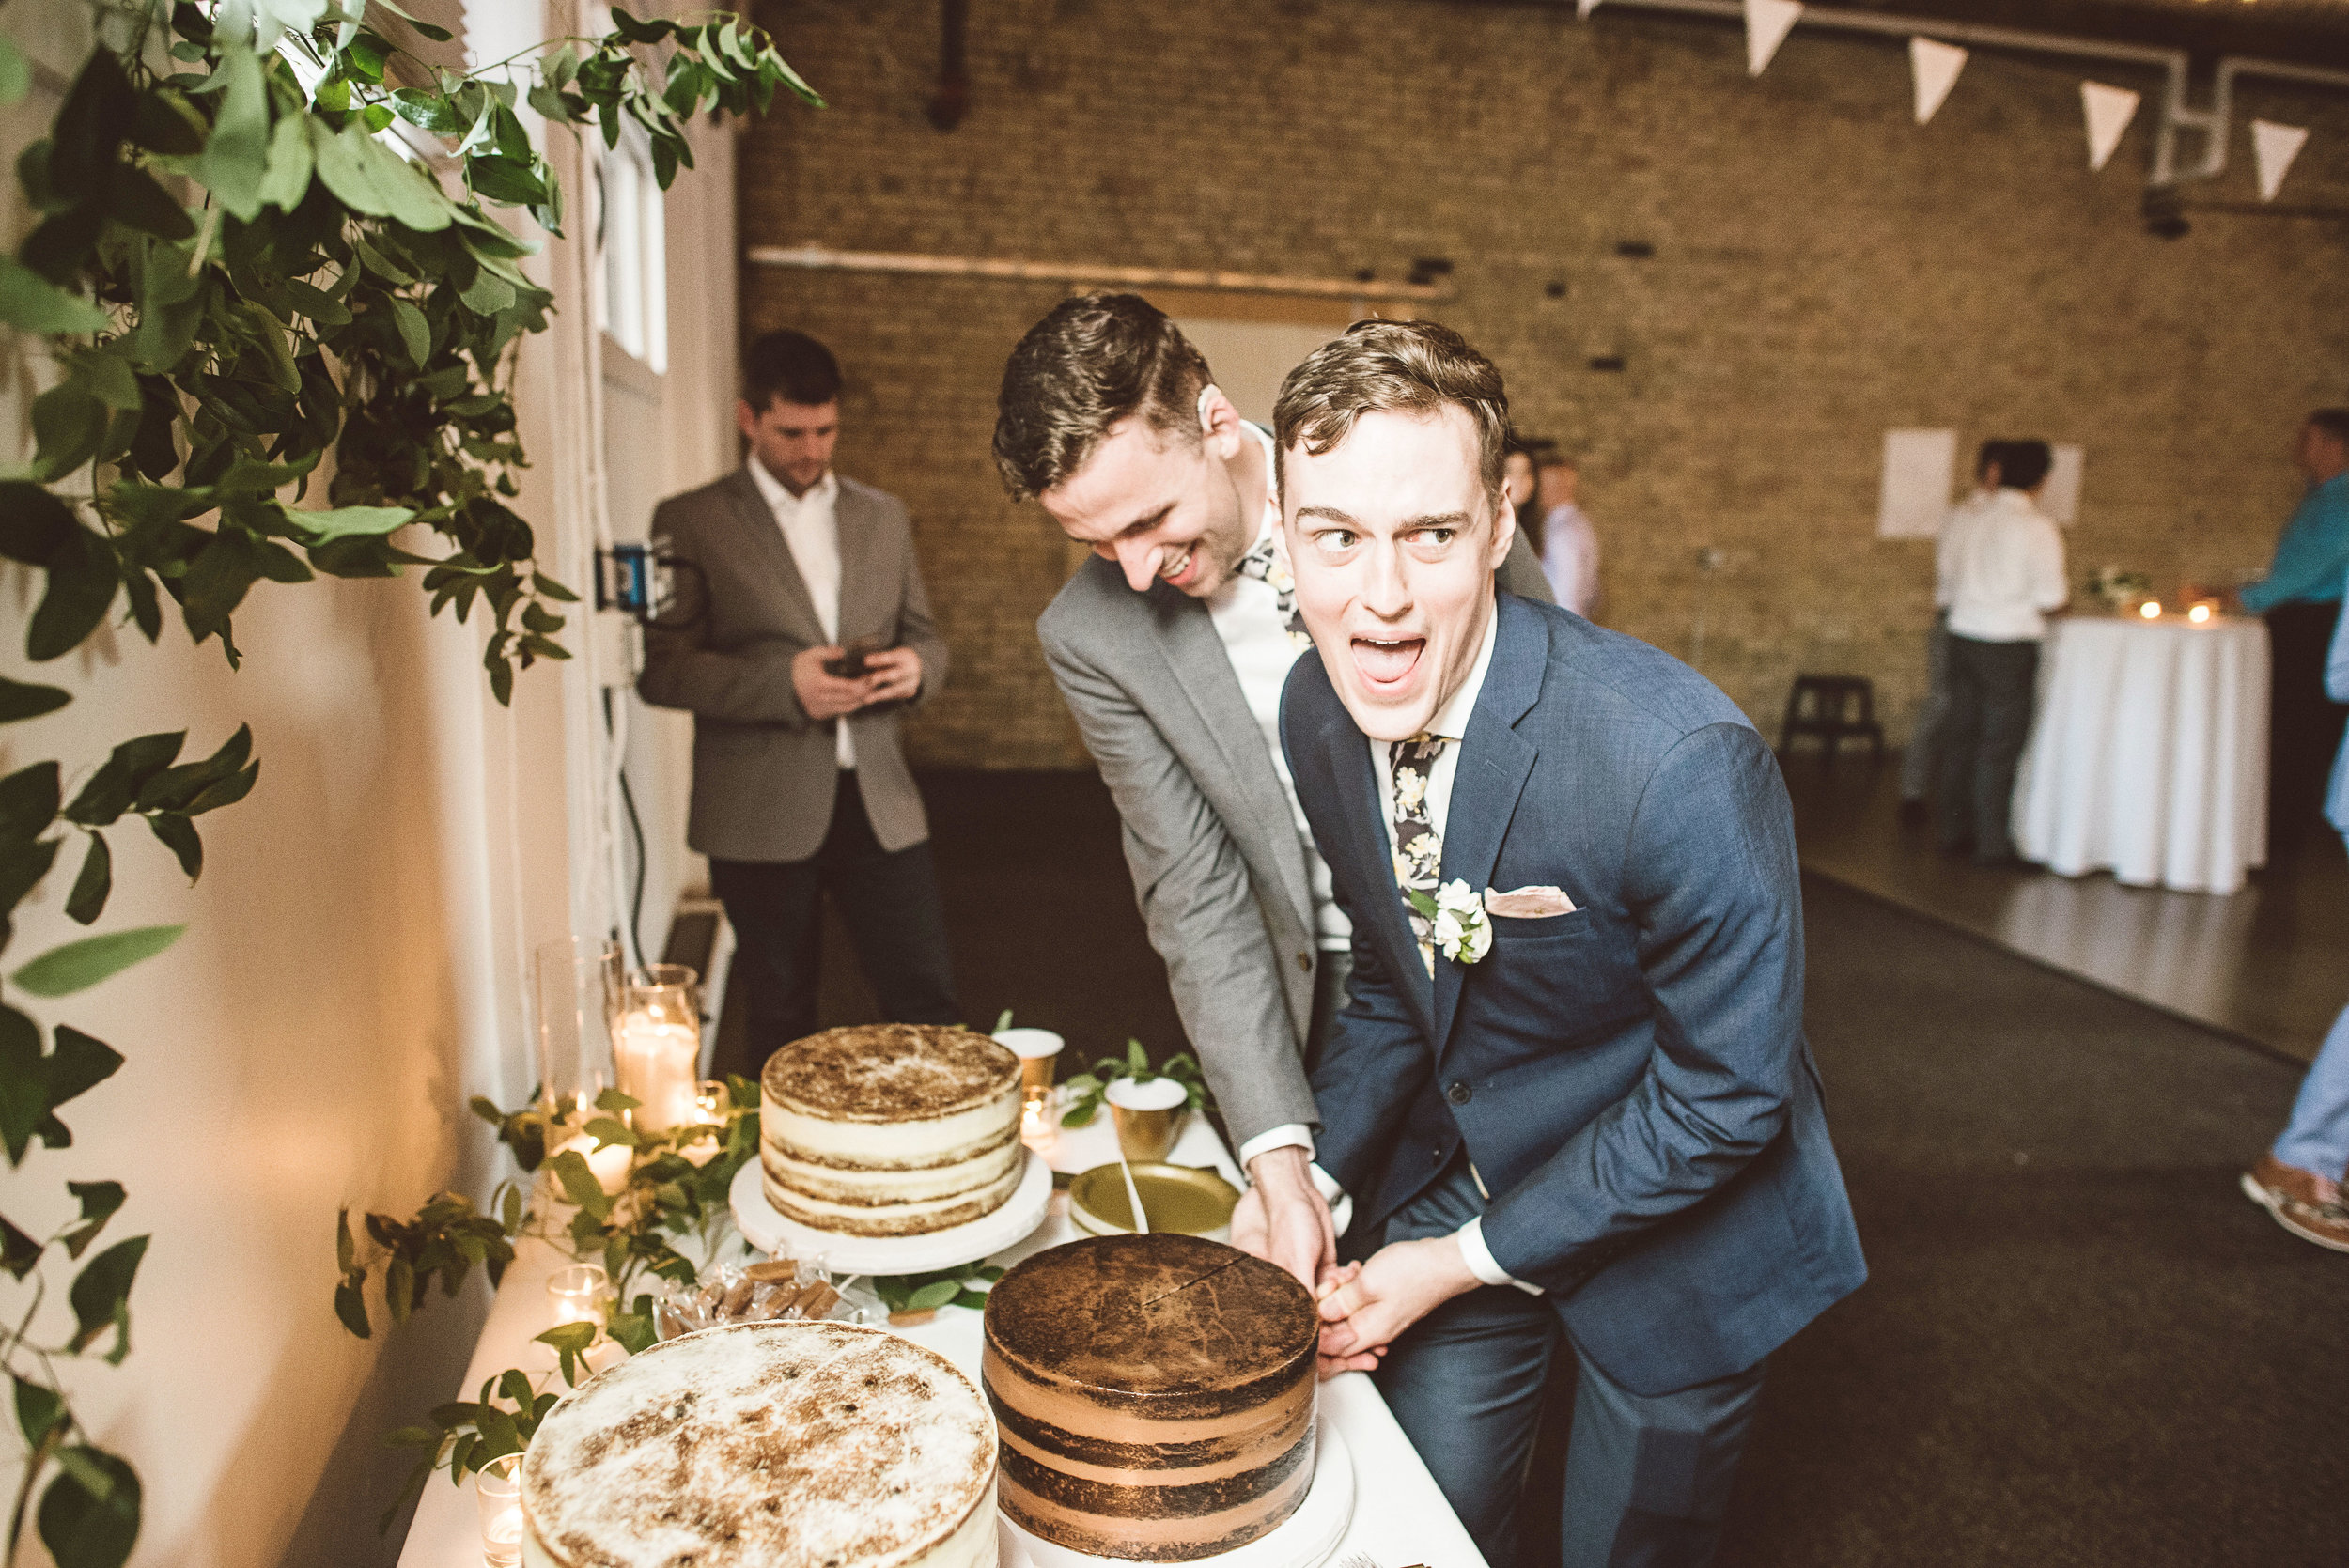 eric_derek_wedding_by_lucas_botz_photography_L75_5148.jpg